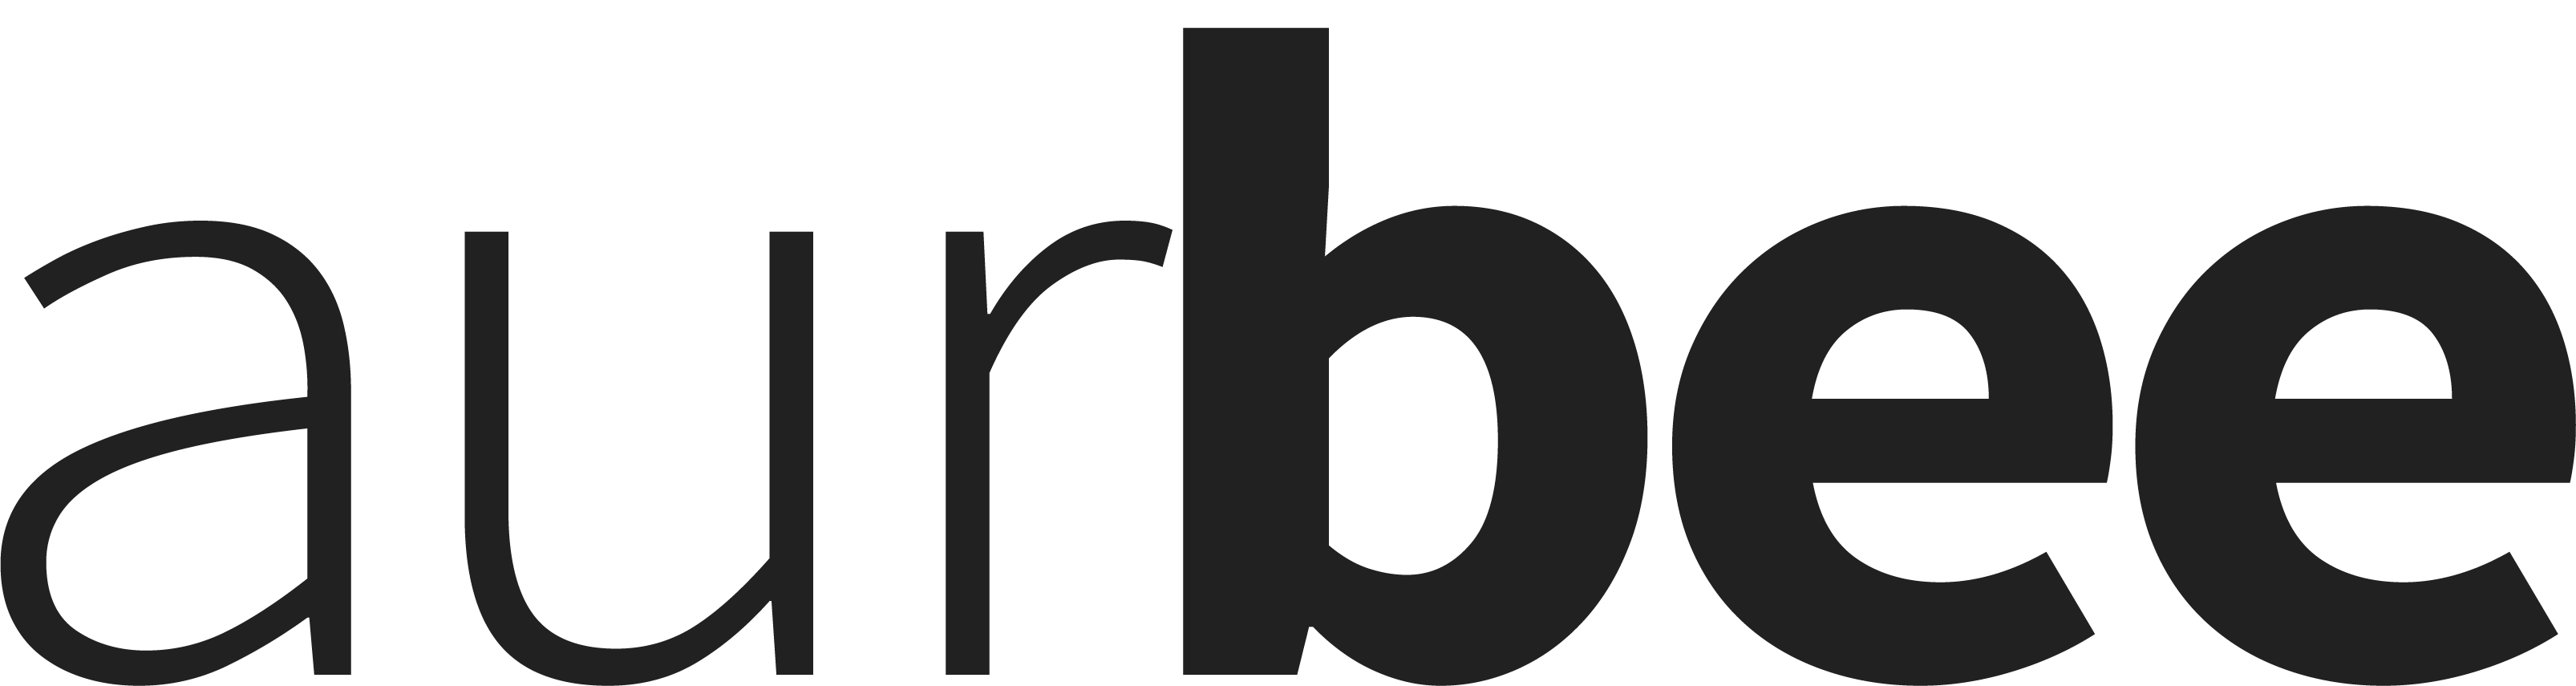 aurbee-letters-black